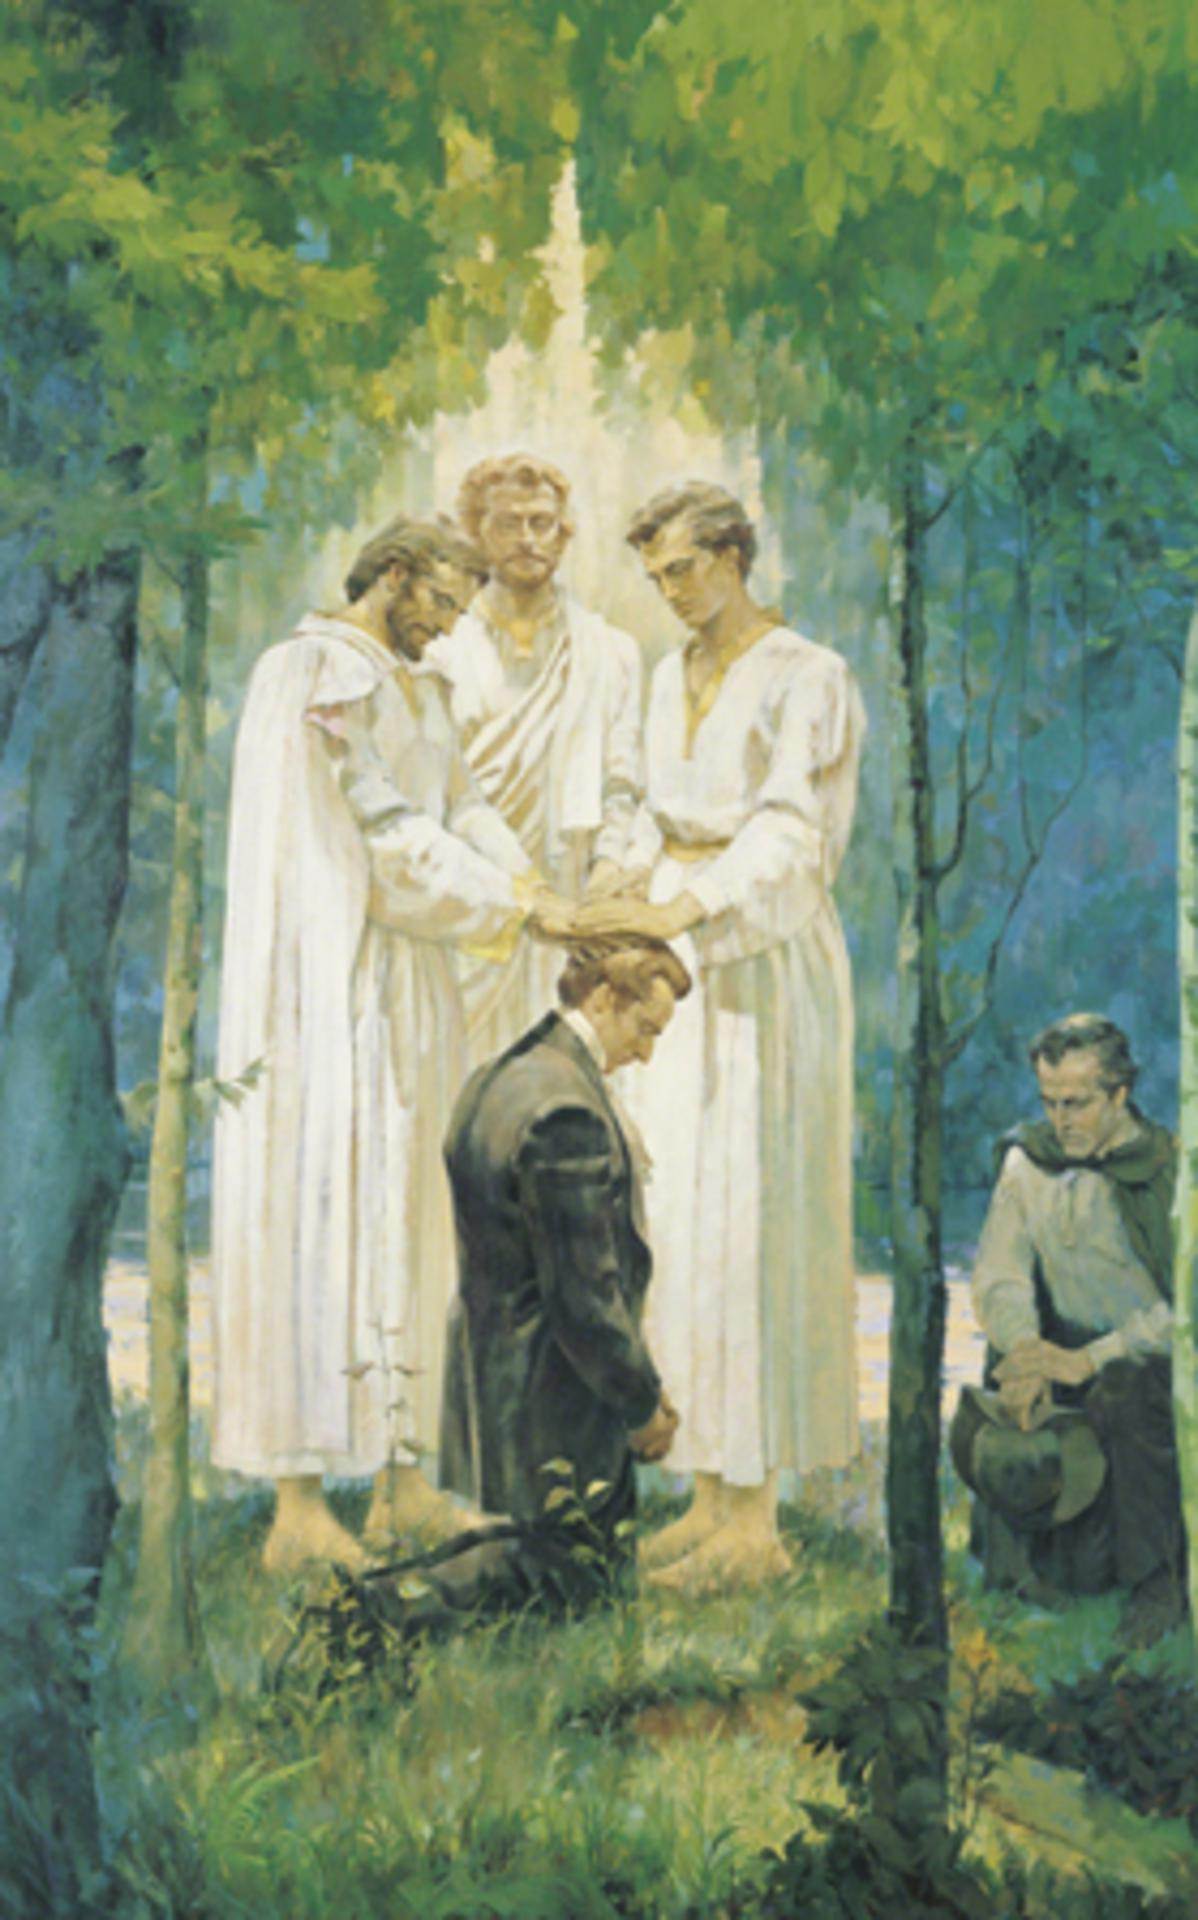 Melchizedek priesthood given to Joseph Smith